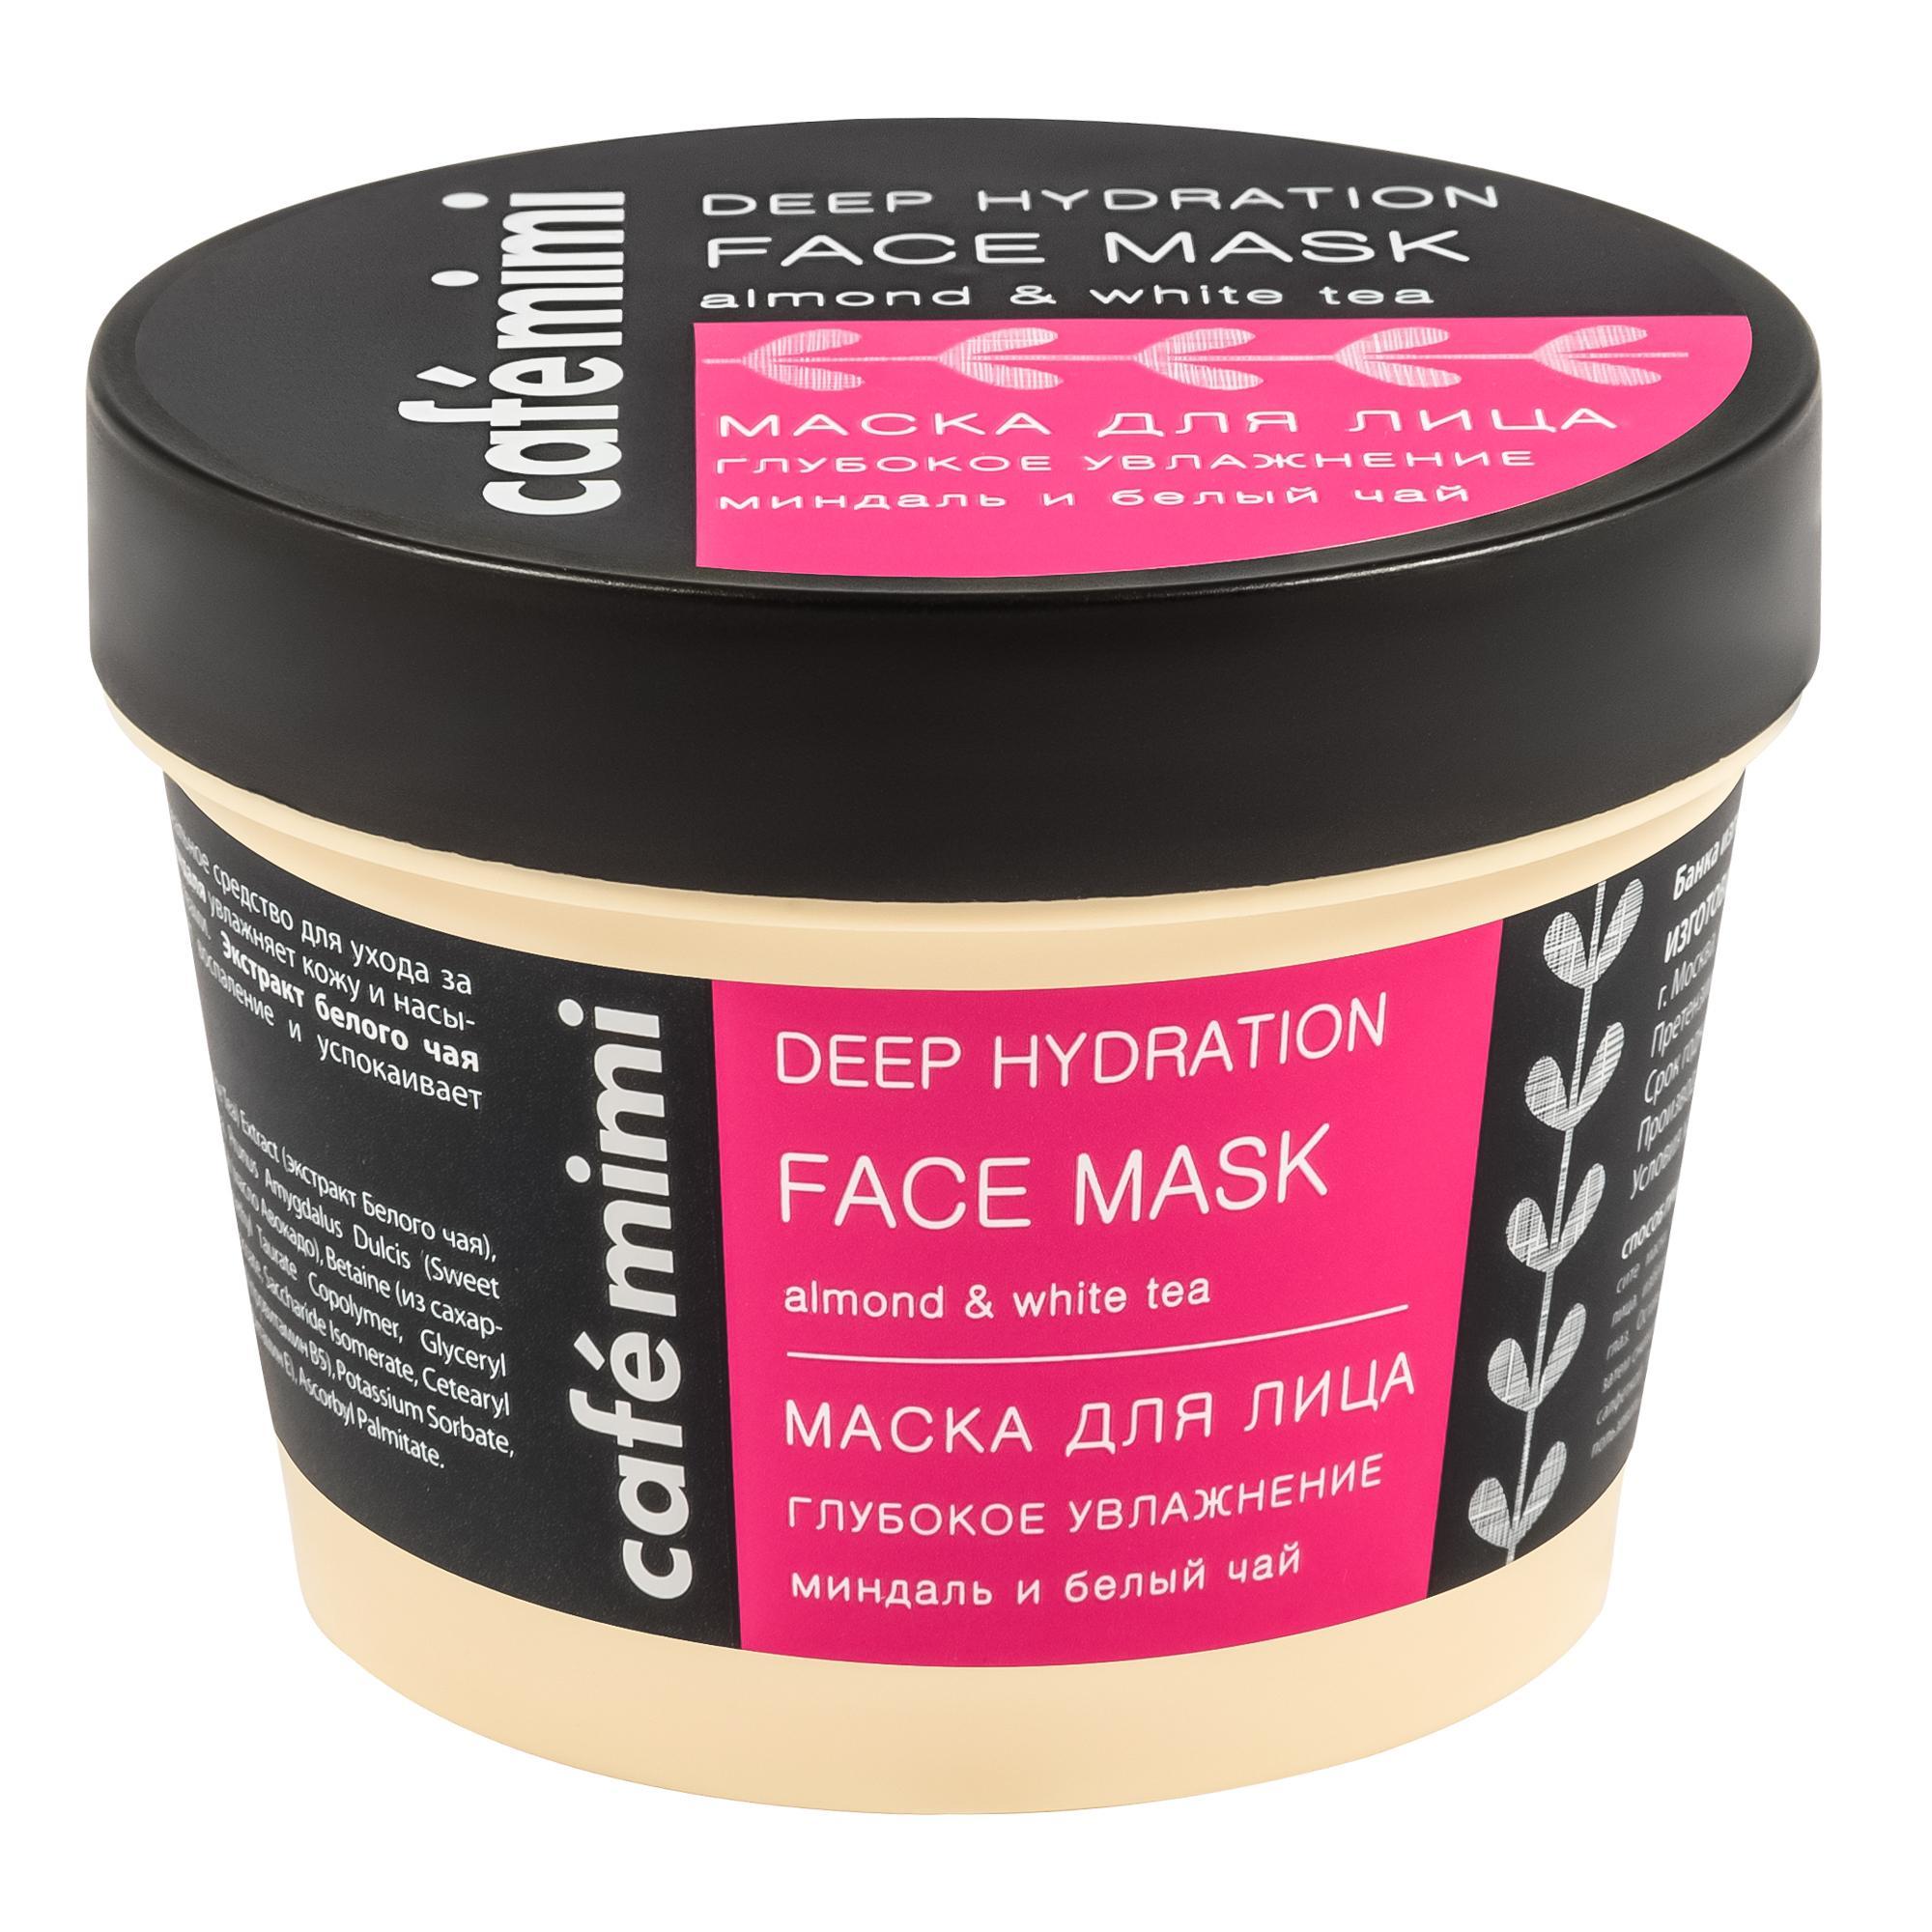 Café Mimi Mascarilla Facial Hidratacion Profunda